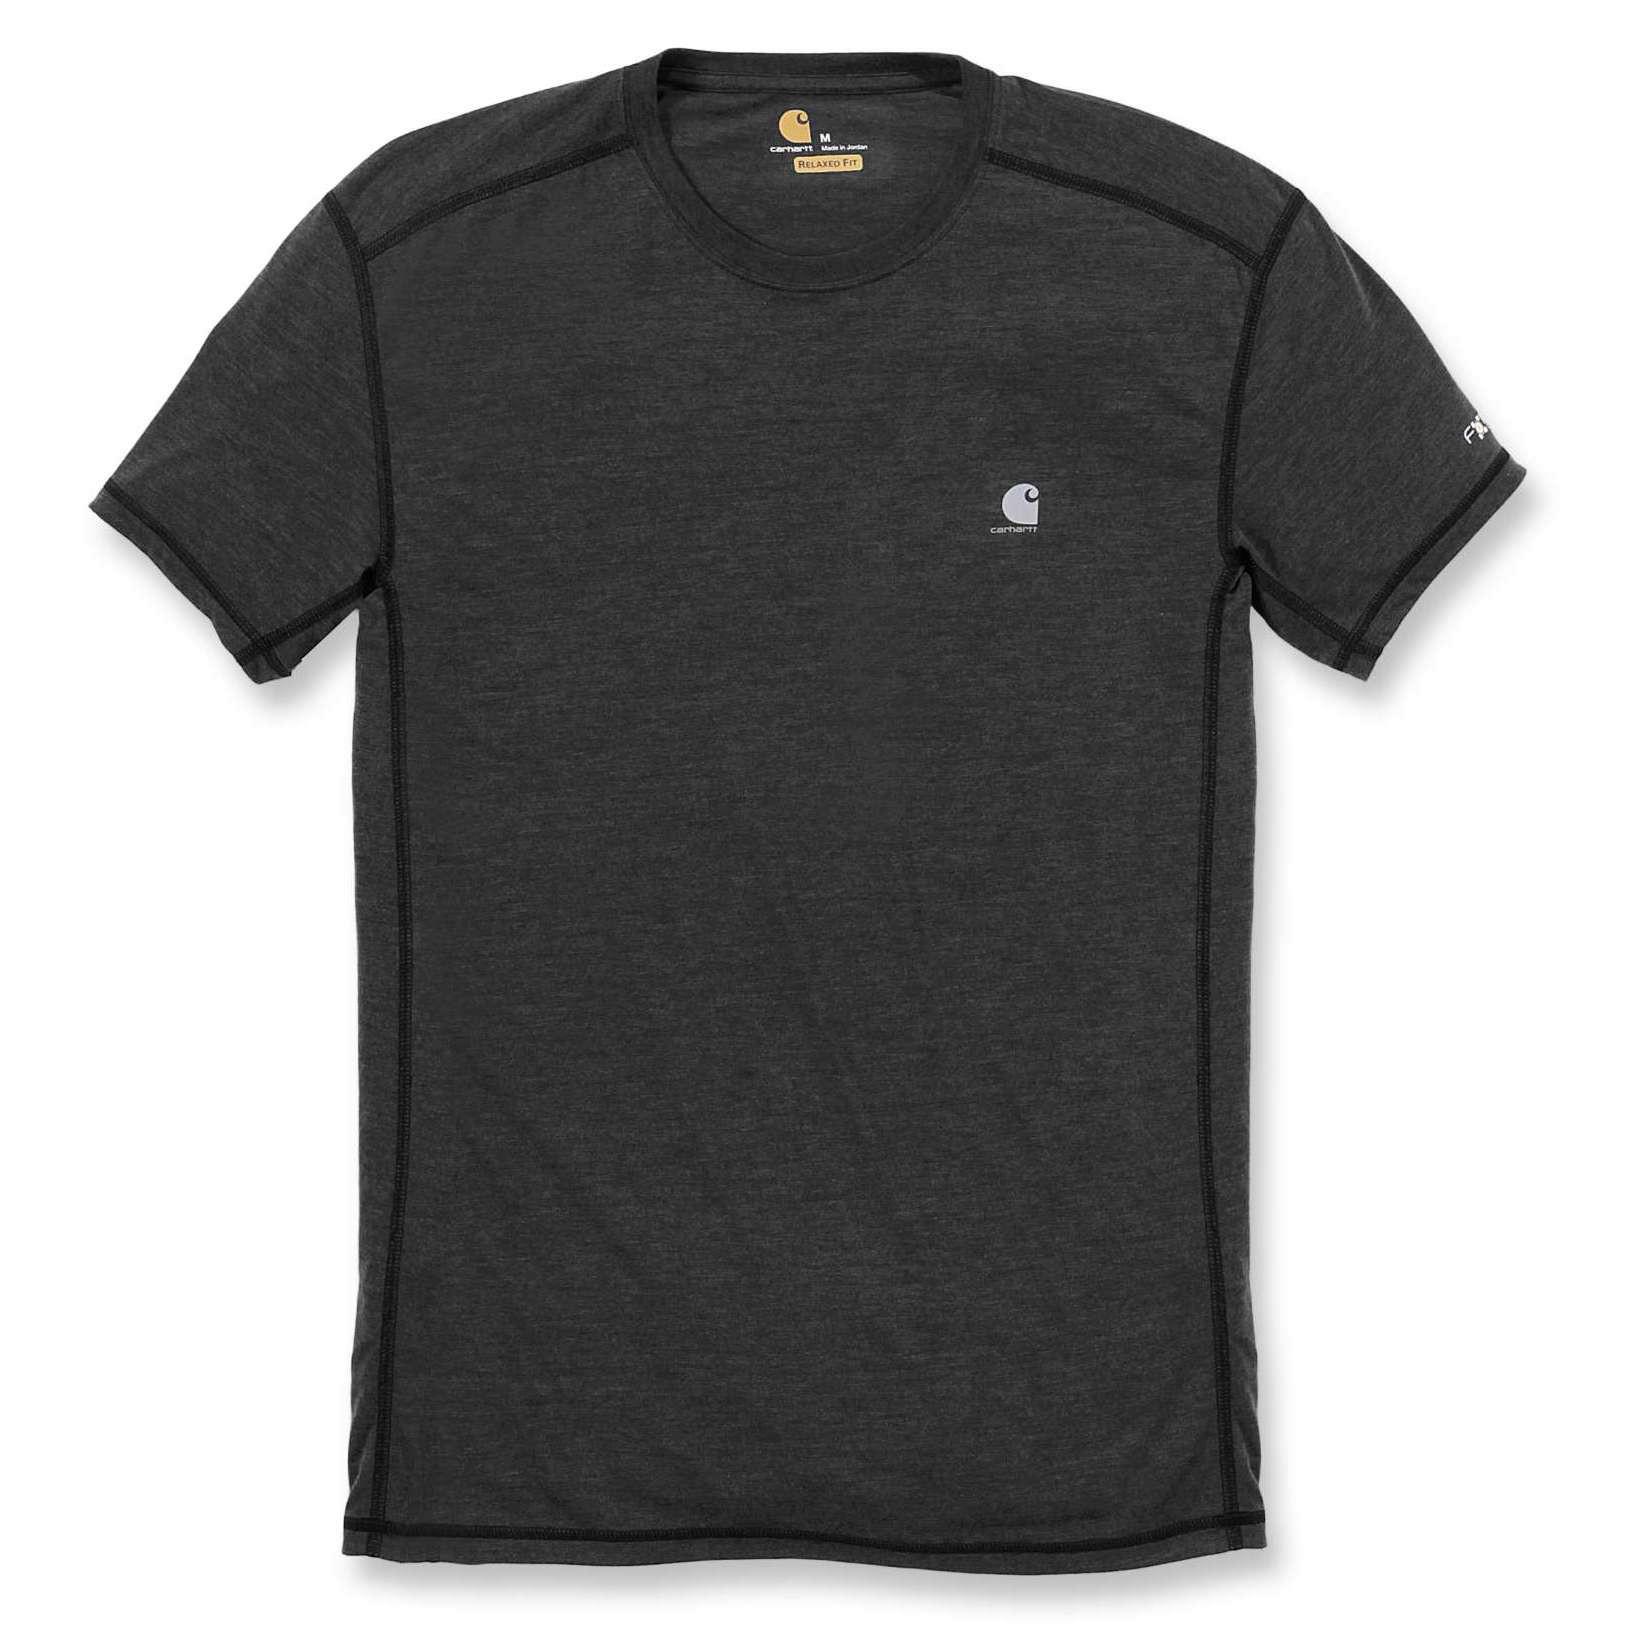 Футболка Carhartt Force Extremes T-Shirt S/S 102960 (Black/Black Heather)